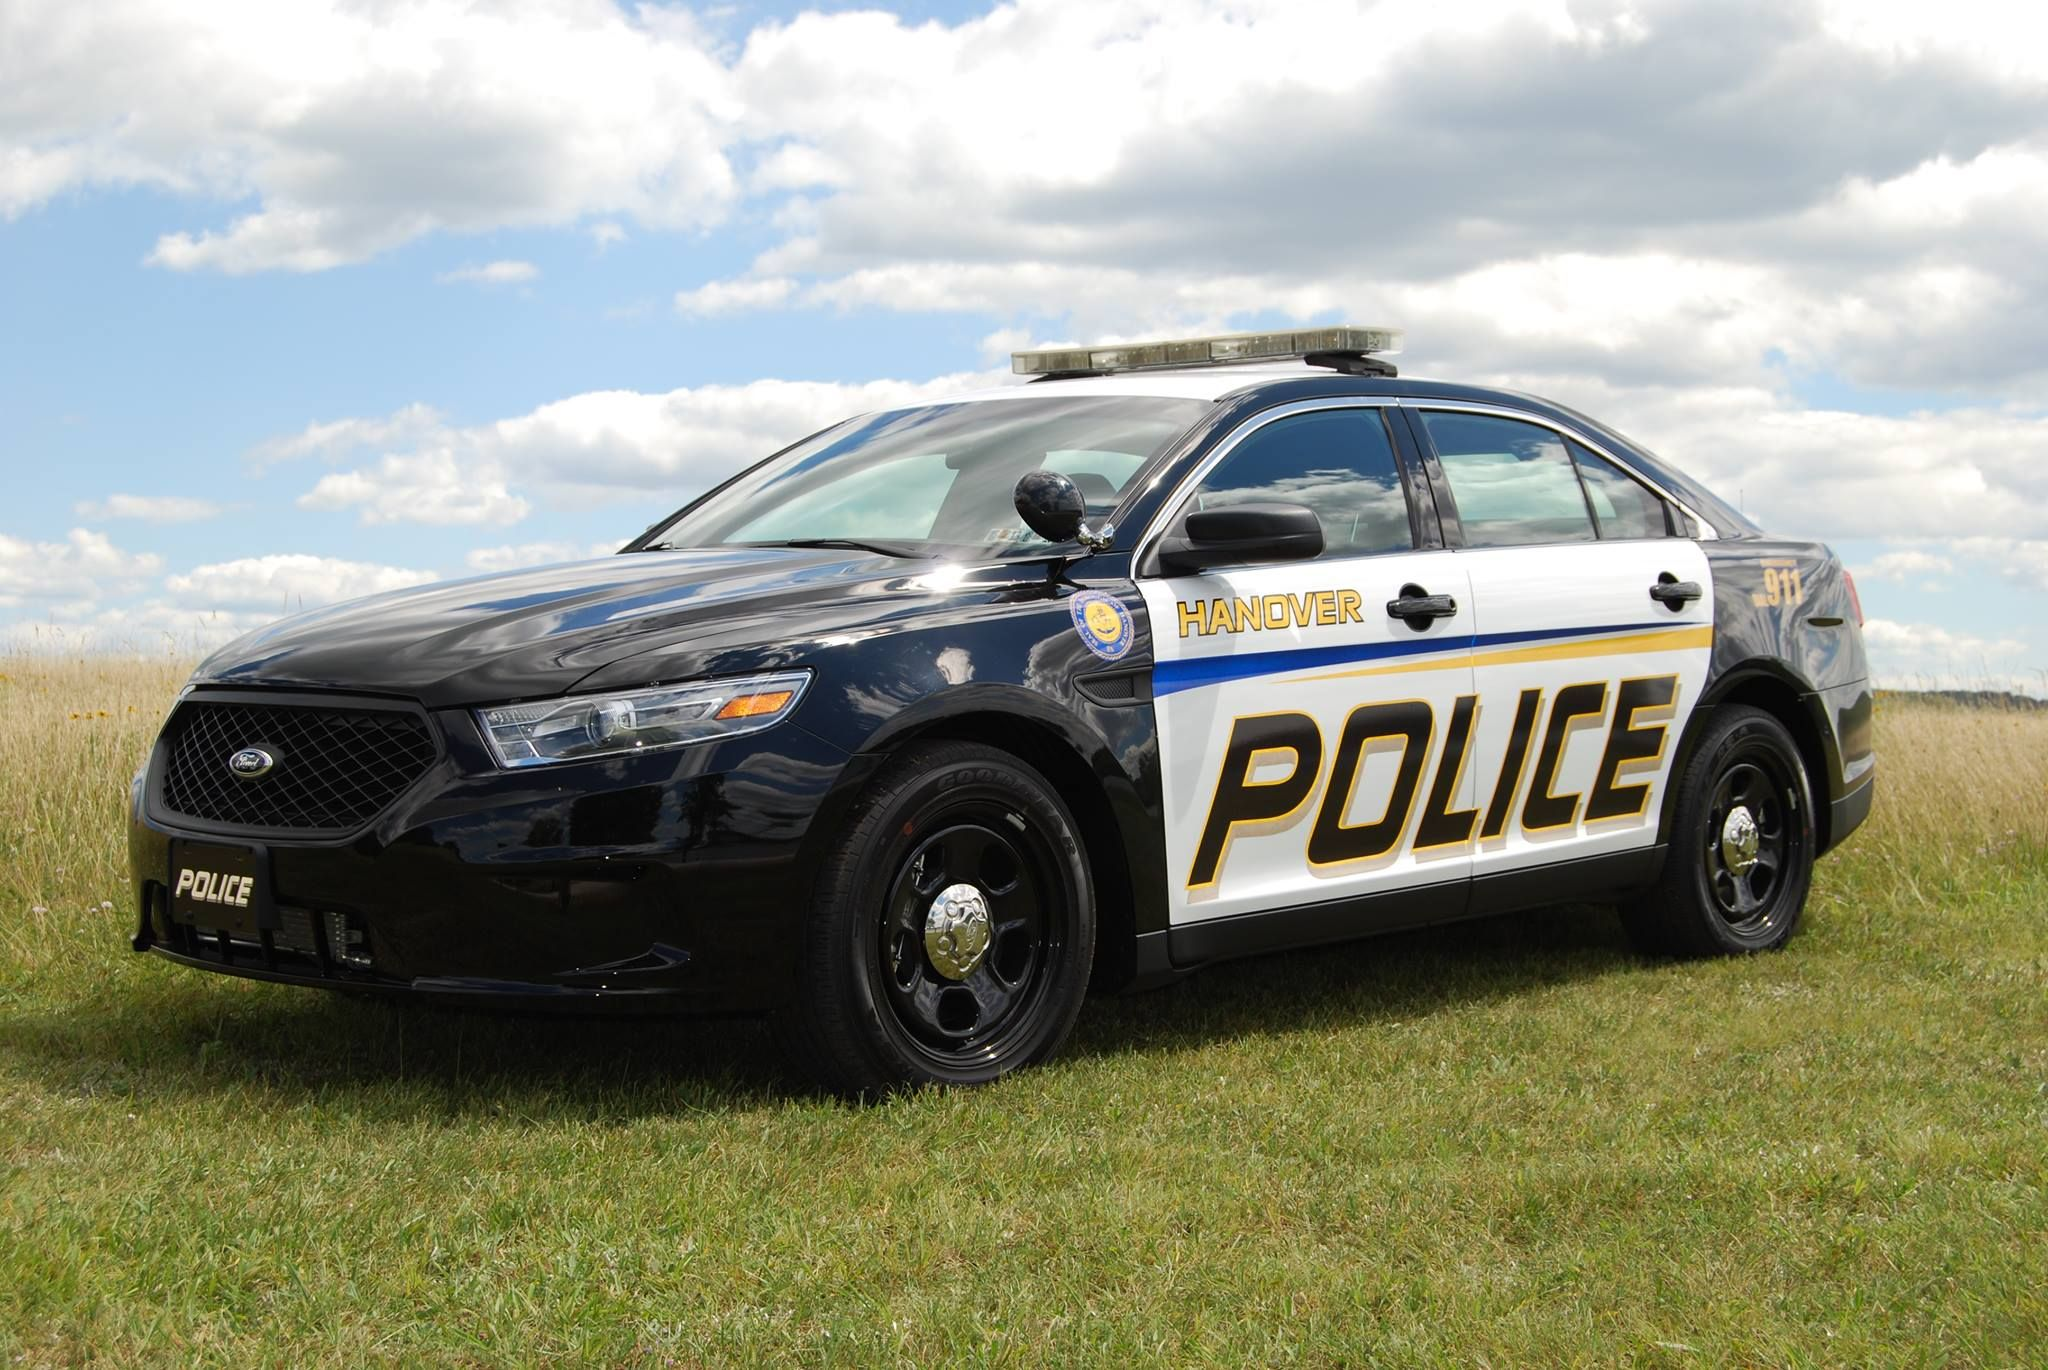 York County Pennsylvania Hanover Police Ford Interceptor Sedan In 2020 York County Police Pennsylvania